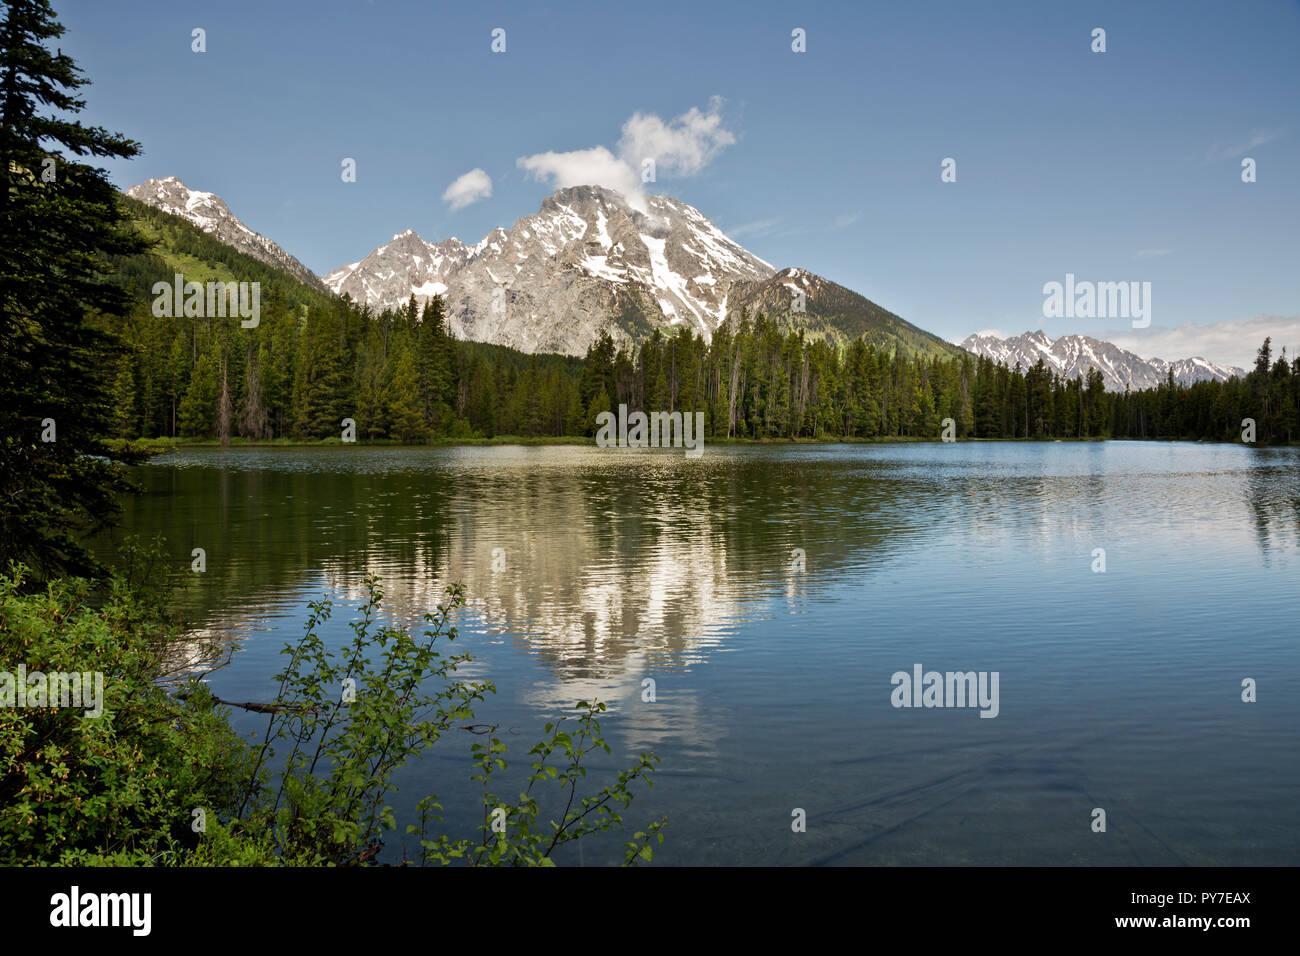 WY02512-00...WYOMING - Mount Woodring reflecting in String Lake of Grand Teton National Park. - Stock Image